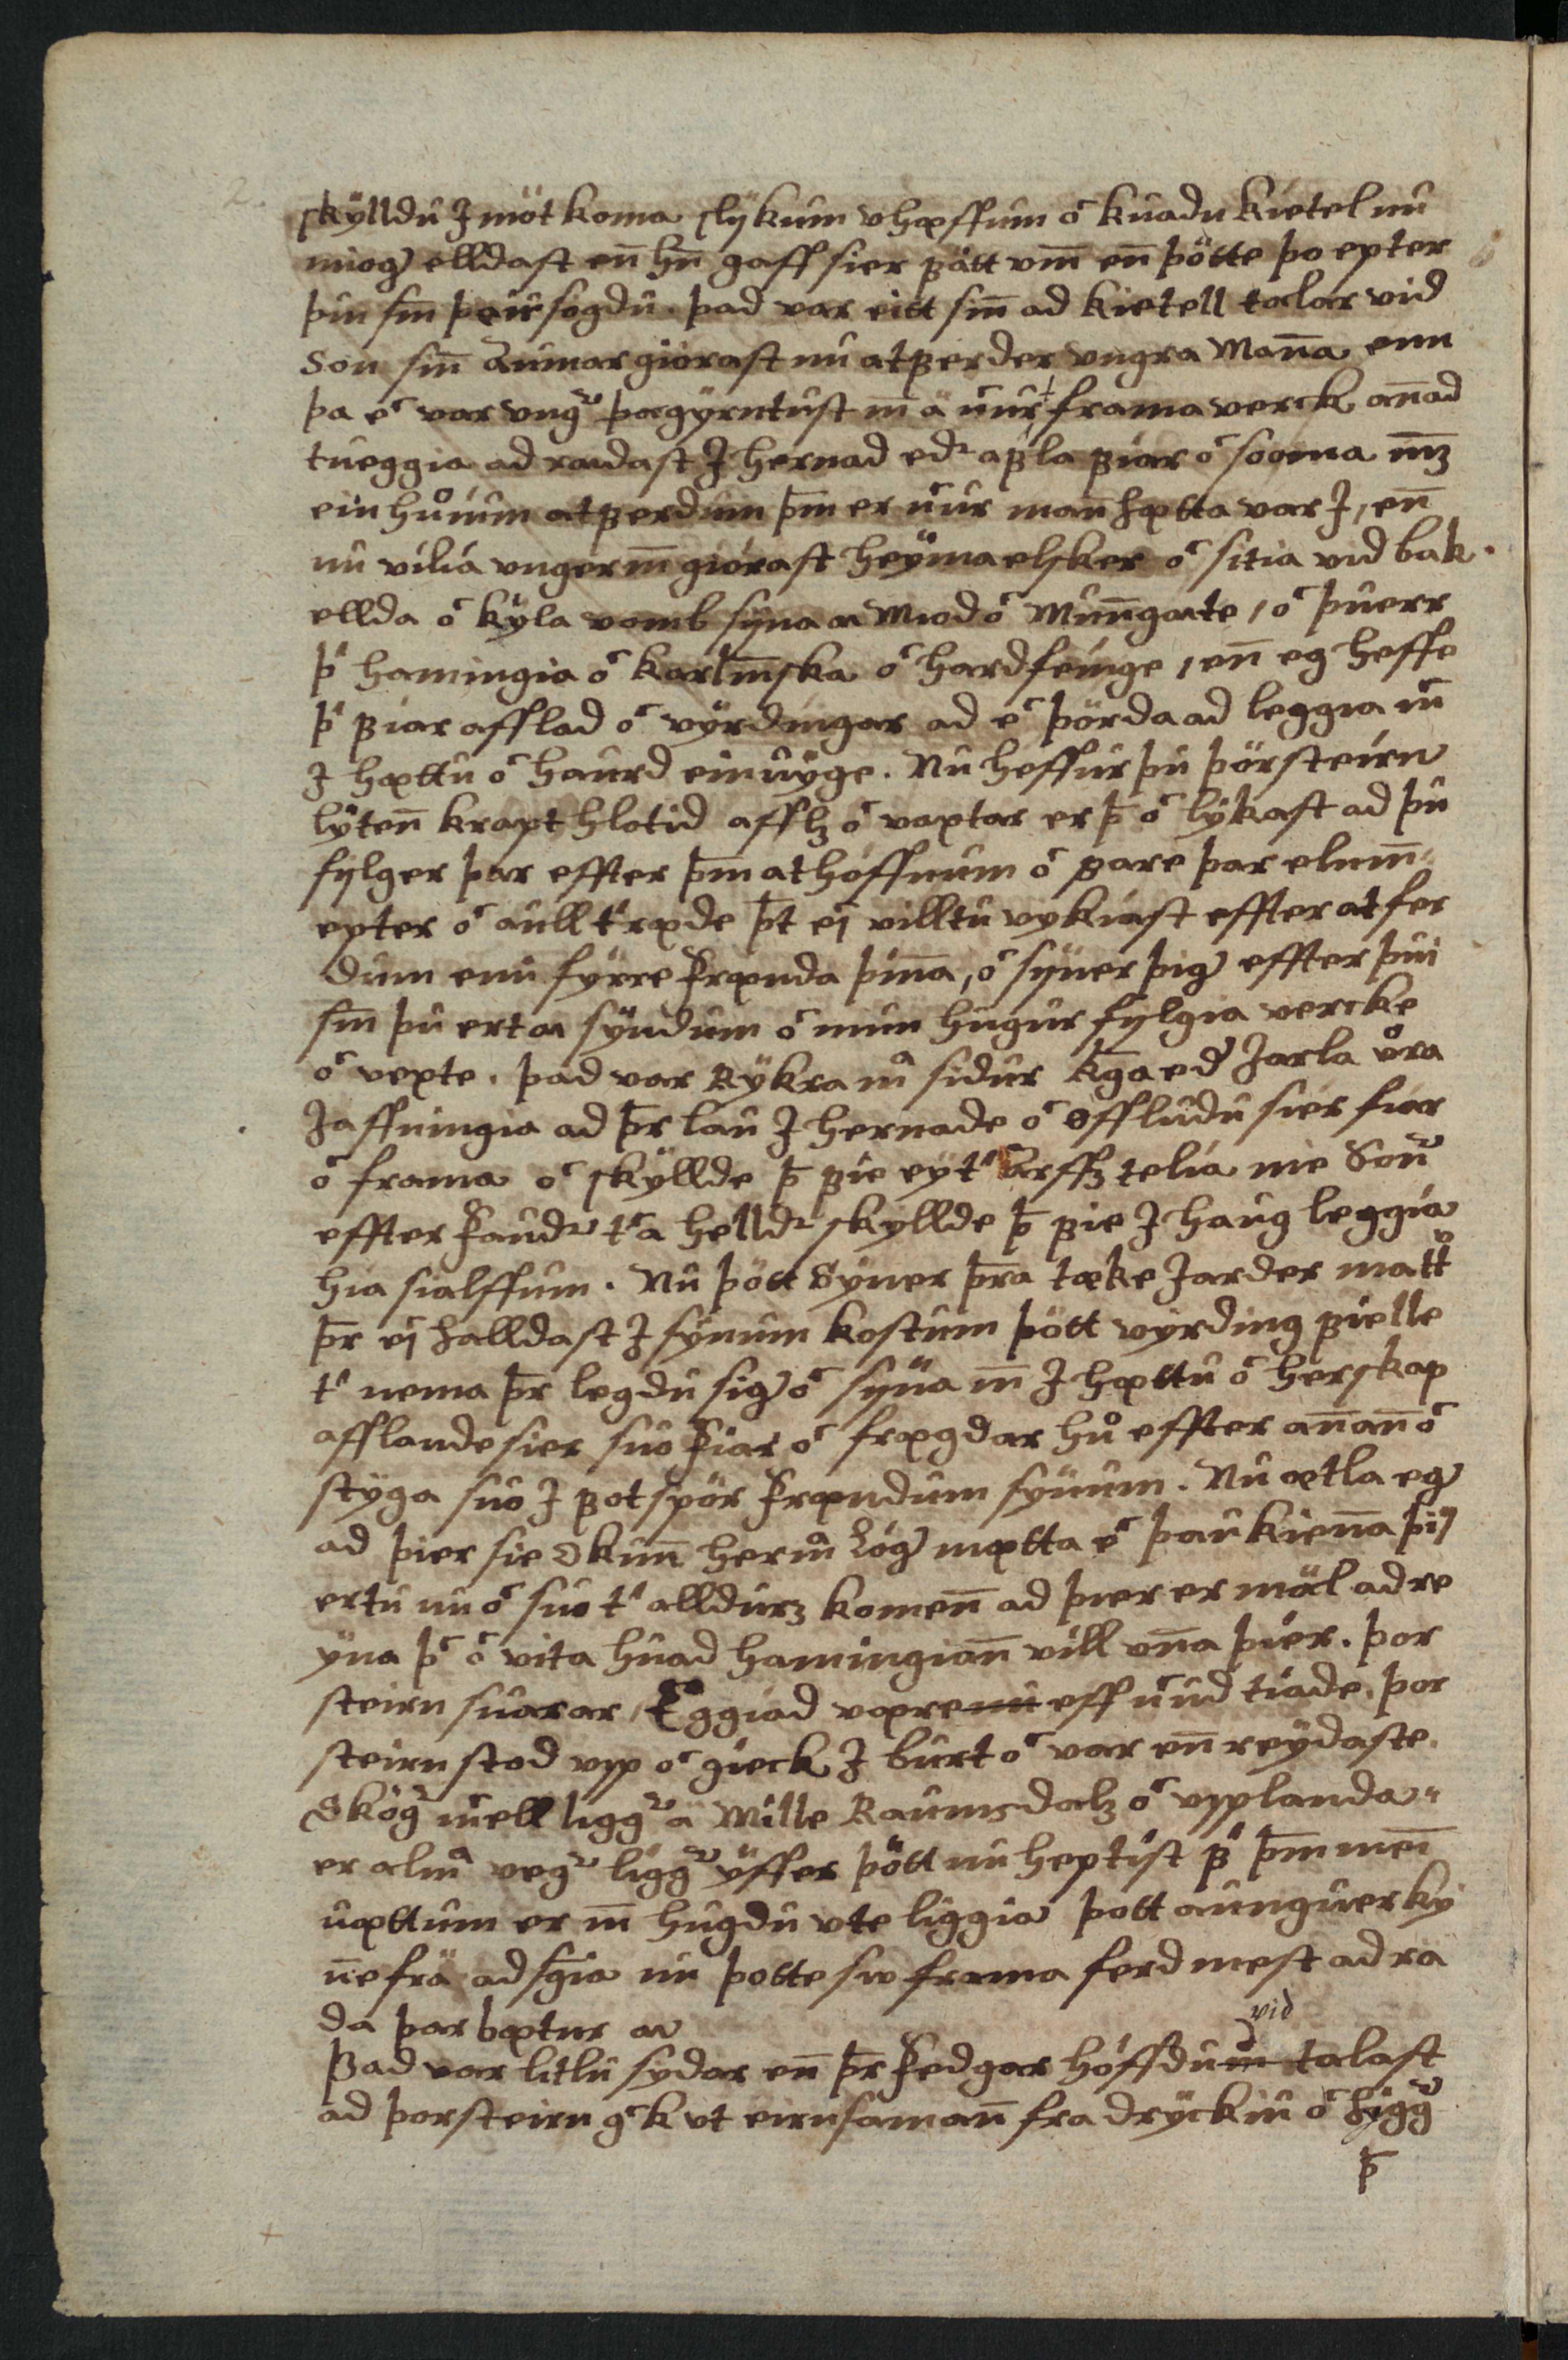 AM 138 fol - 1v